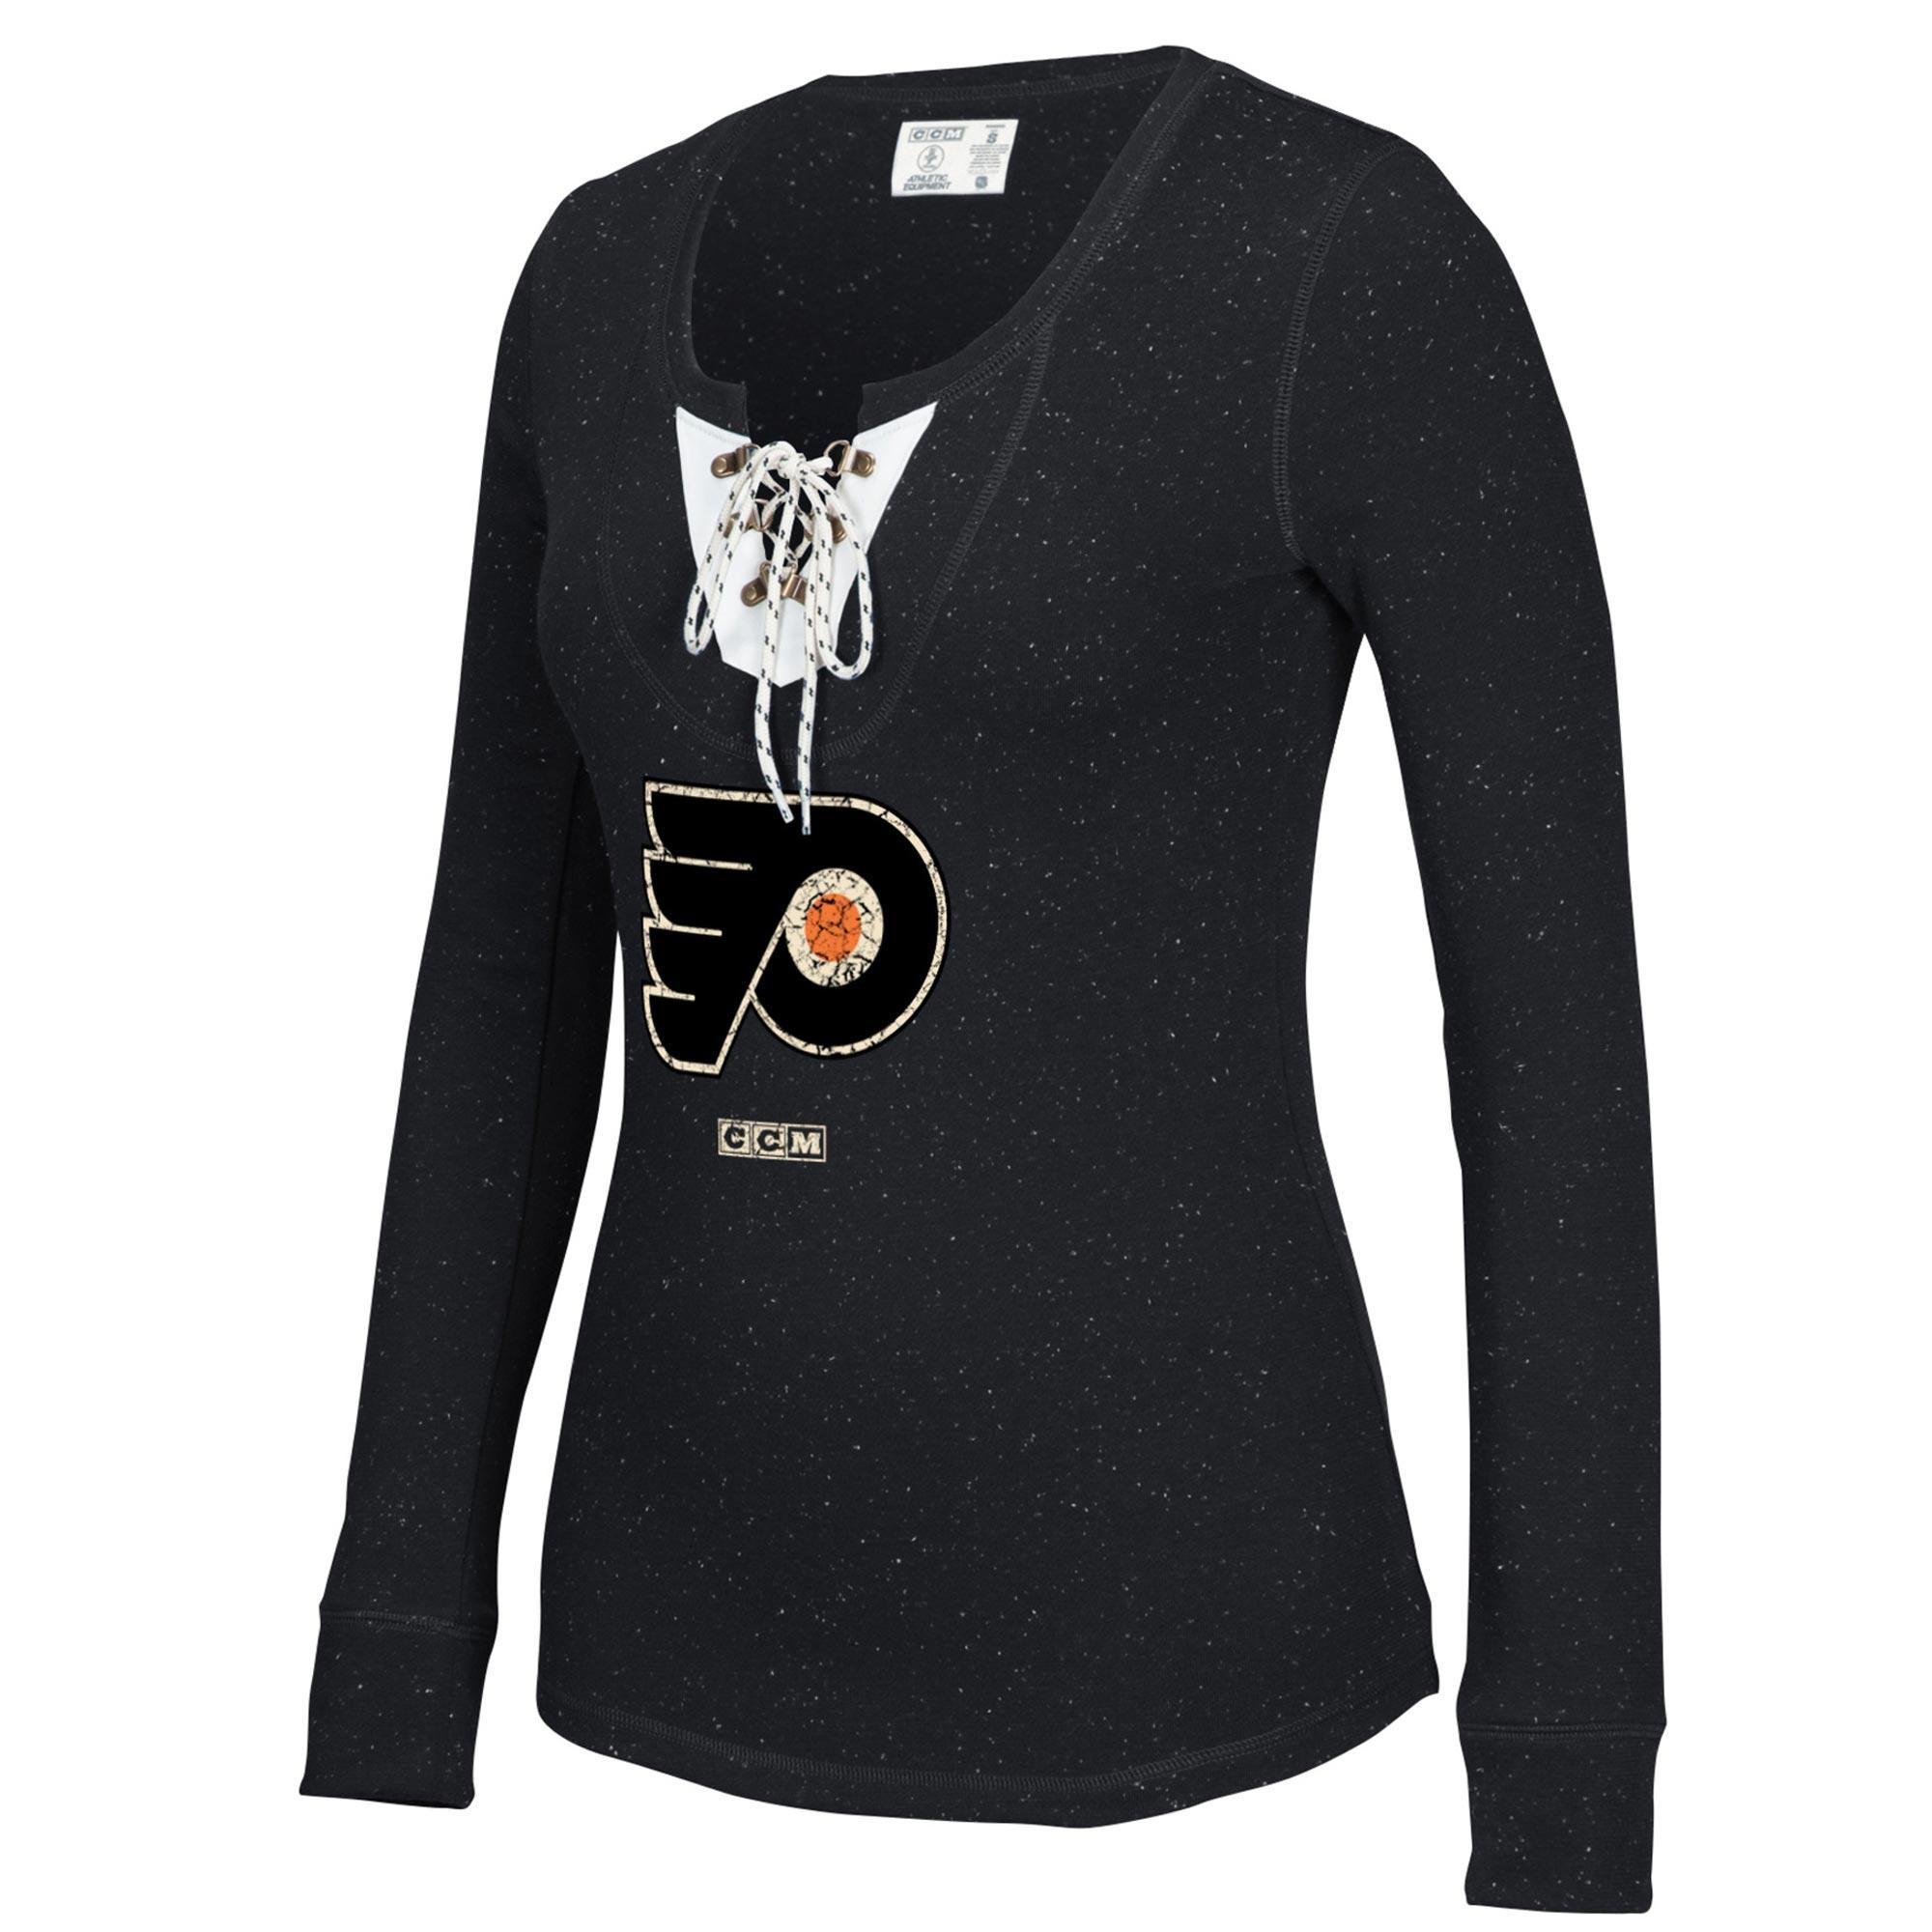 Philadelphia Flyers CCM Women's Lace-Up Henley T-Shirt - Black